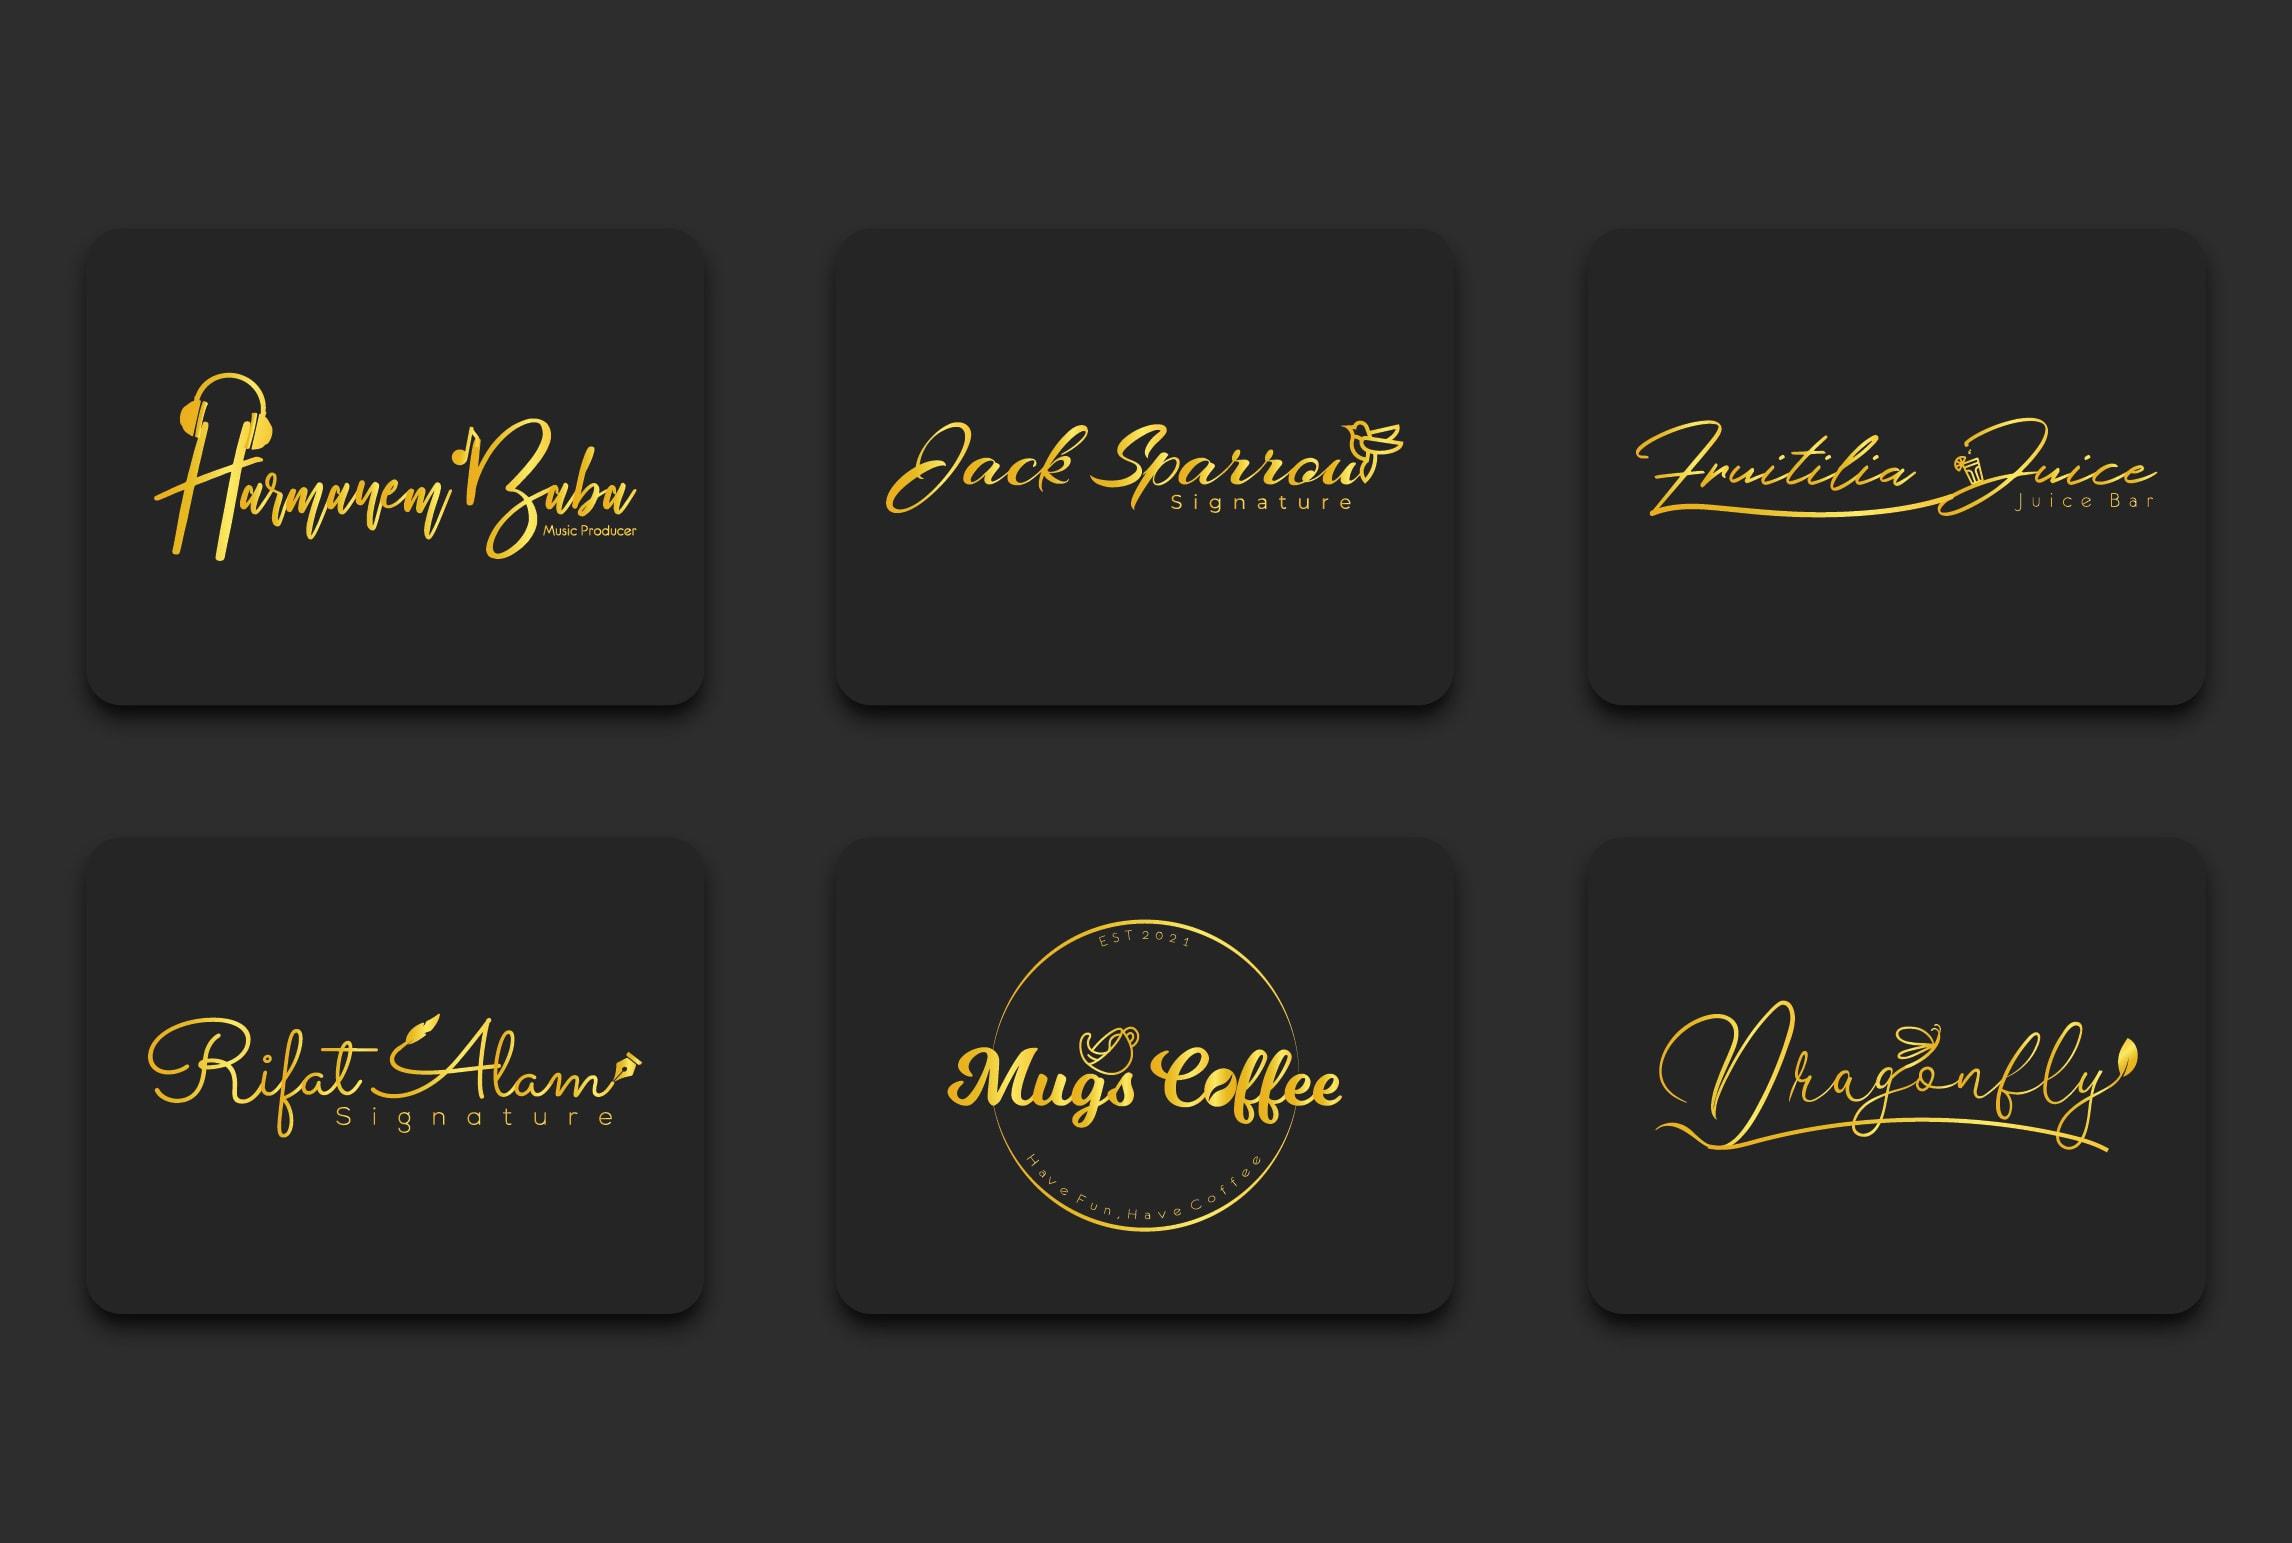 I will create signature logo or email signature